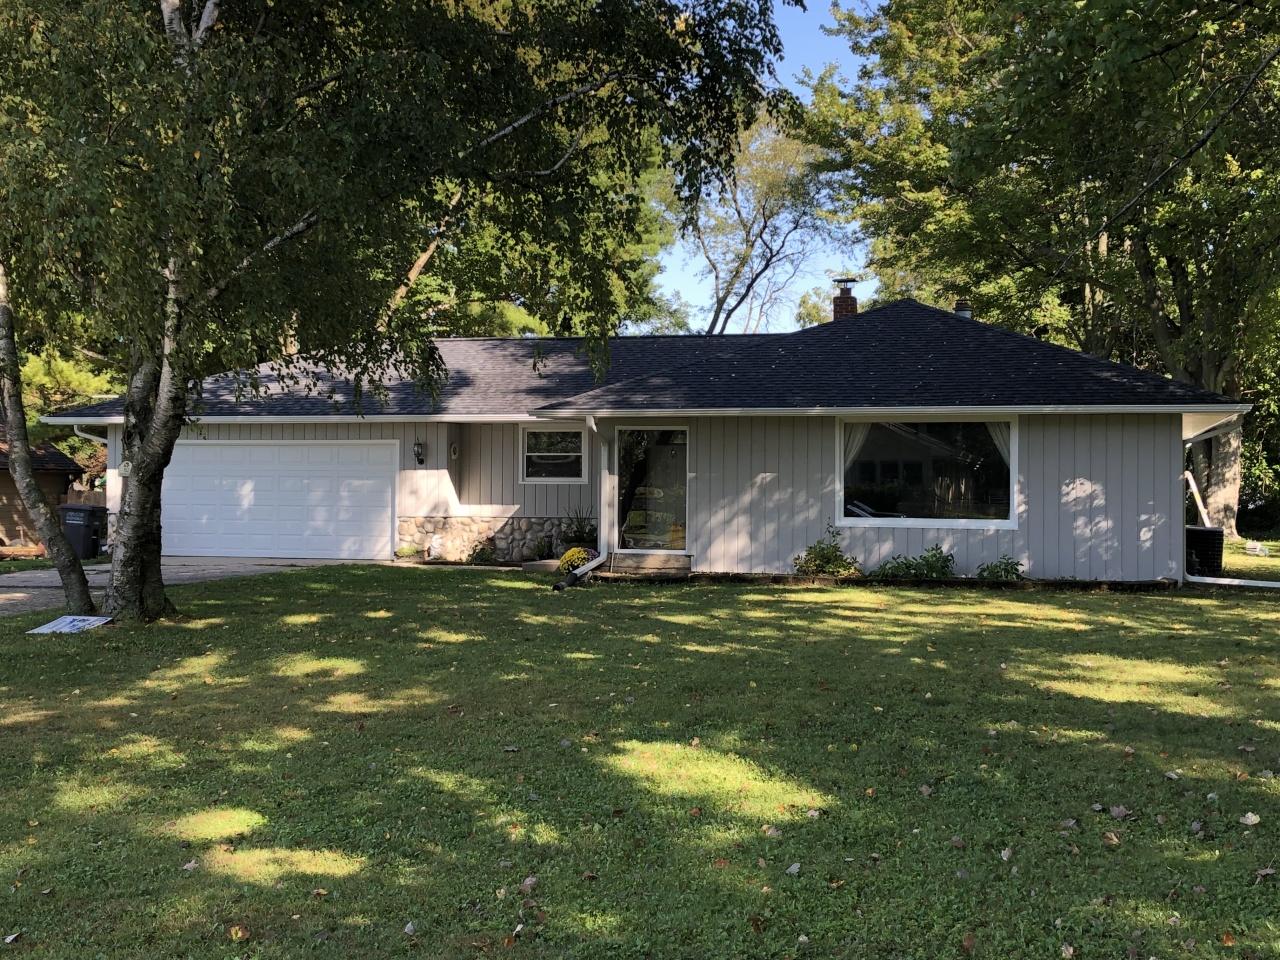 812 Marymere Dr, Oconomowoc, Wisconsin 53066, 3 Bedrooms Bedrooms, 6 Rooms Rooms,1 BathroomBathrooms,Single-Family,For Sale,Marymere Dr,1658269